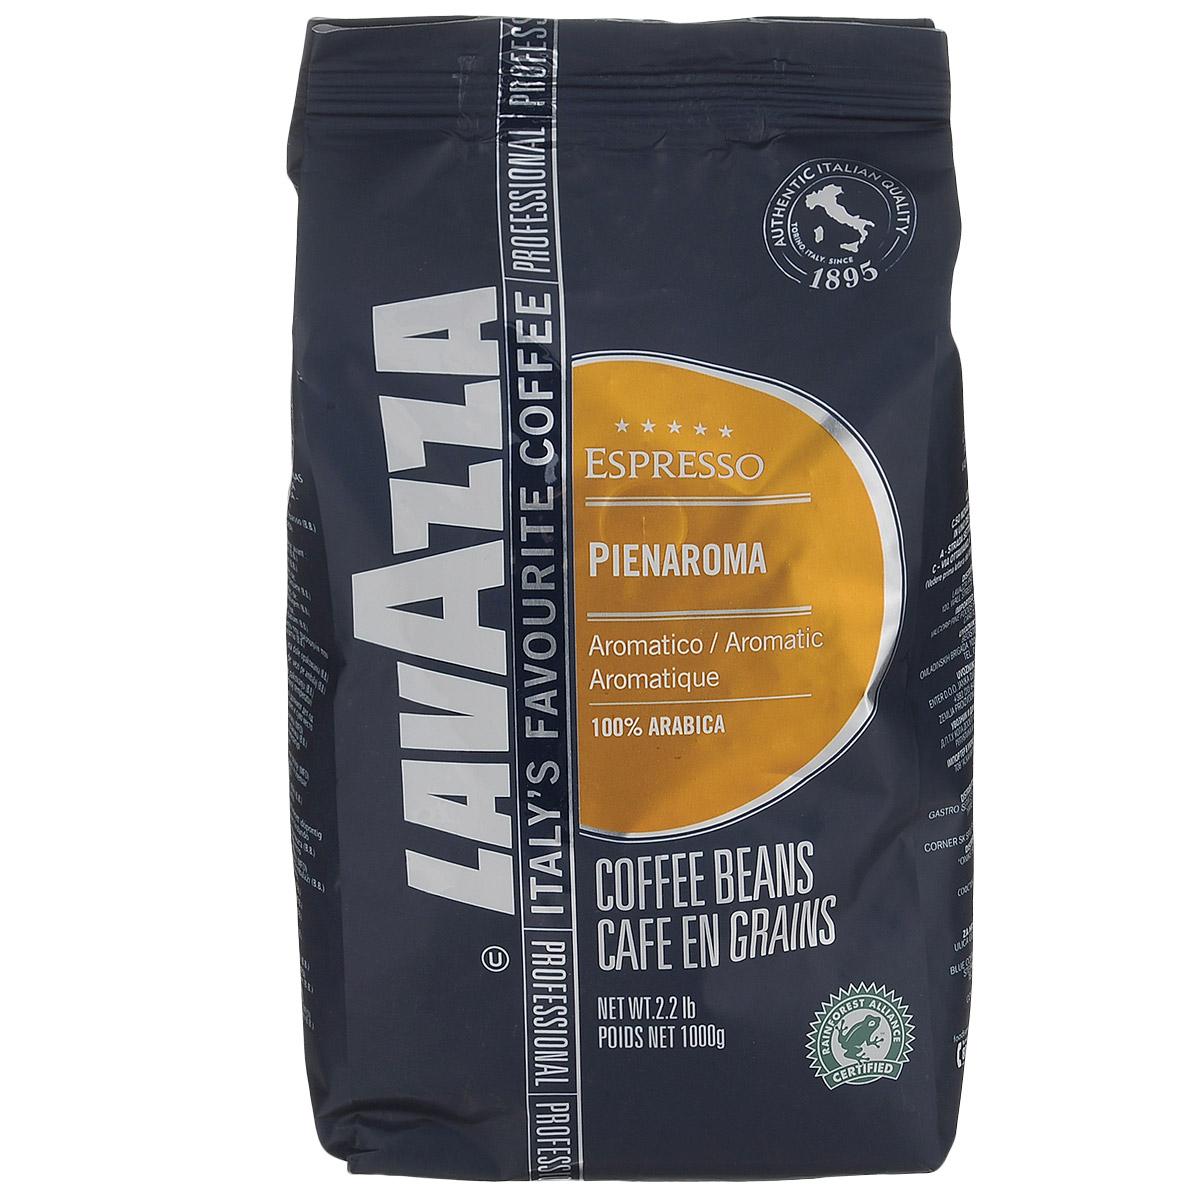 Lavazza Pienaroma кофе в зернах, 1 кг lavazza grande ristorazione rossa кофе в зернах 1 кг